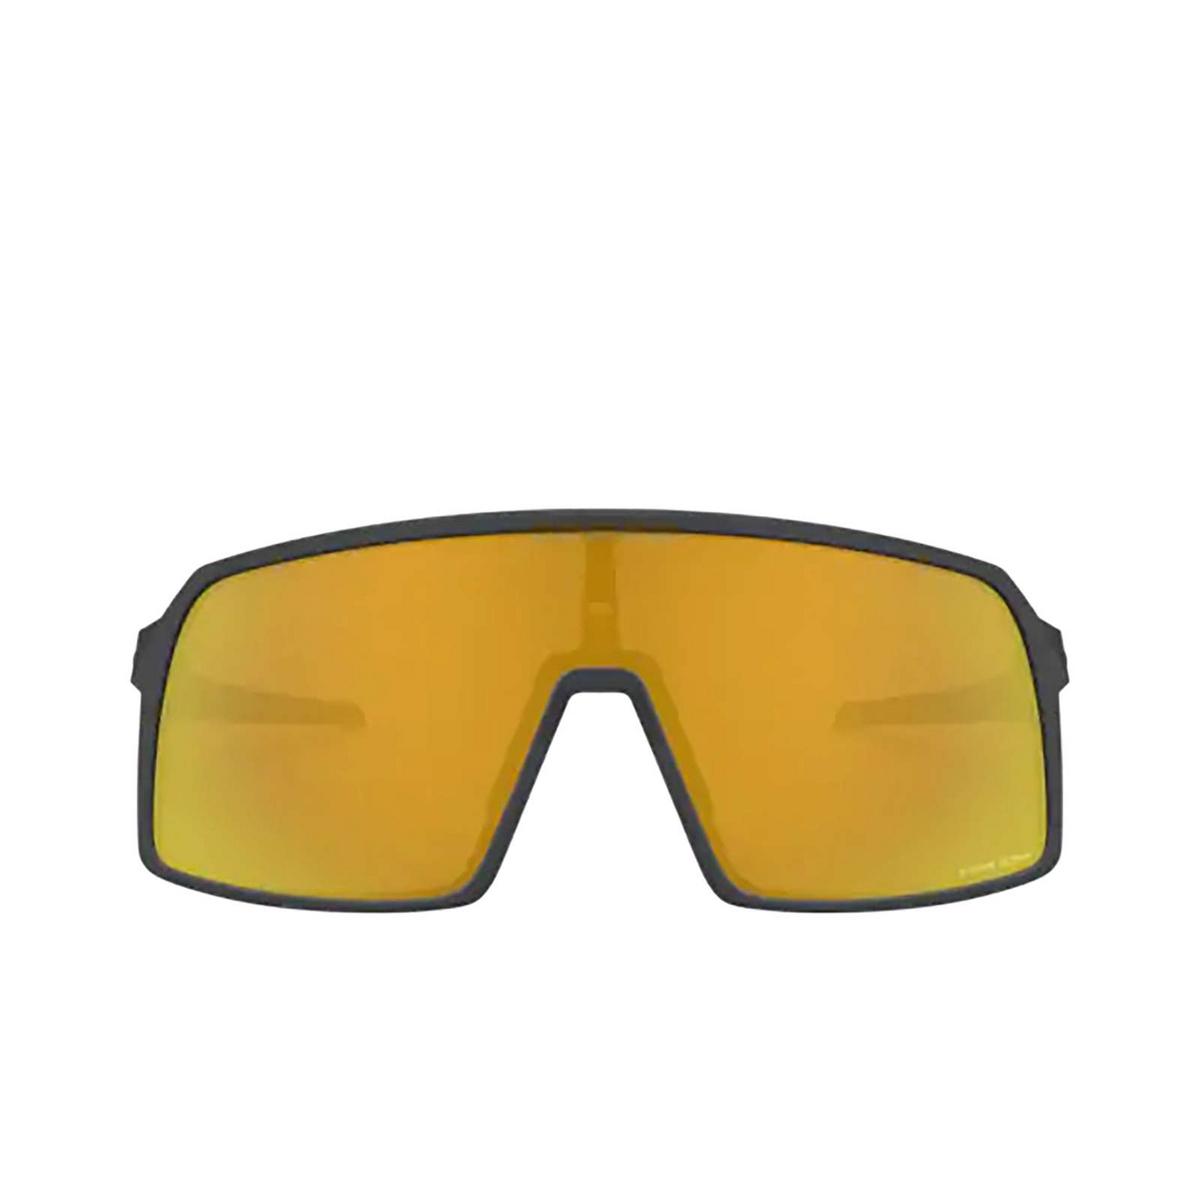 Oakley® Sport Sunglasses: Sutro OO9406 color Matte Carbon 940605 - front view.